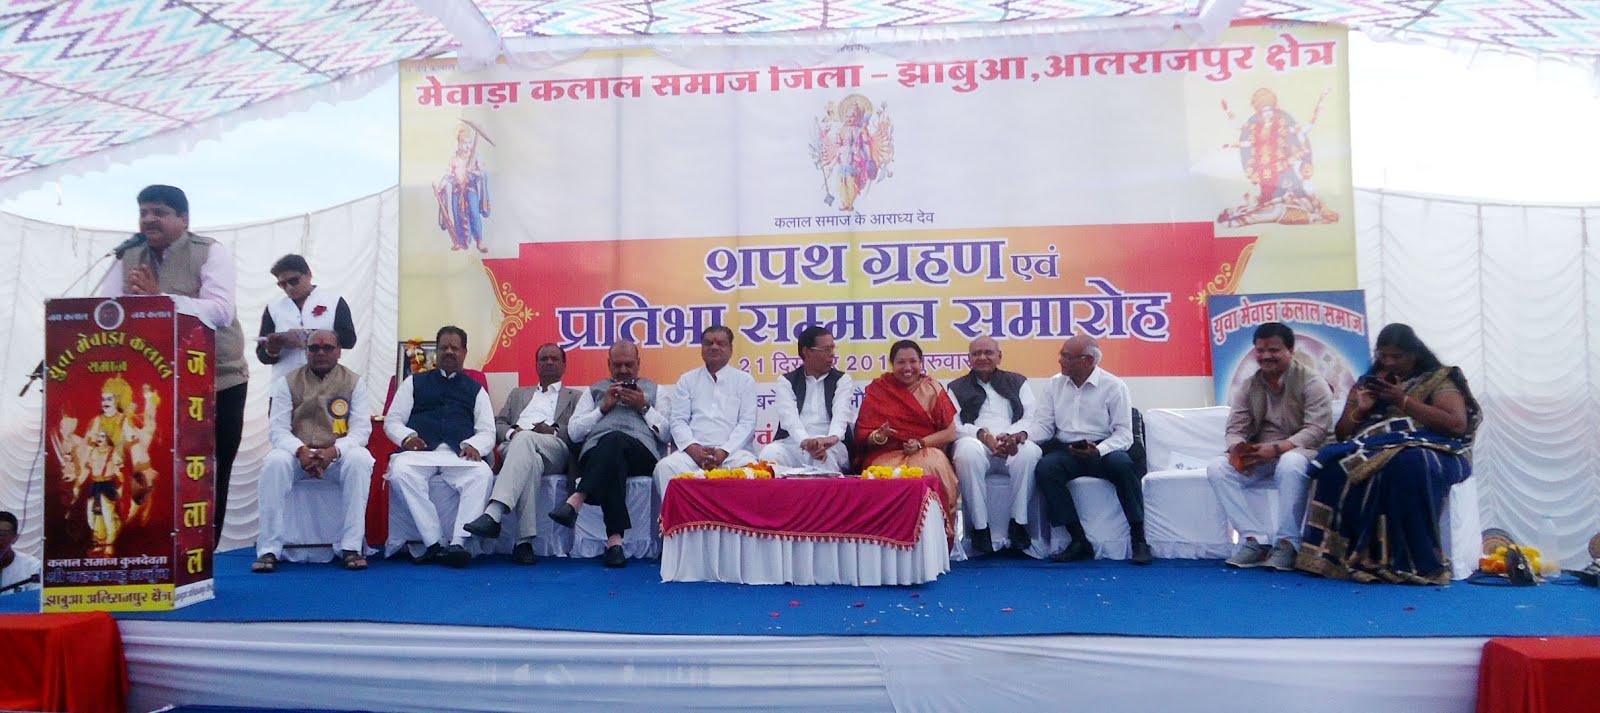 मेवाडा कलाल समाज का शपथ एवं प्रतिभा सम्मान समारोह सम्पन्न-mewada-kalal-samaj